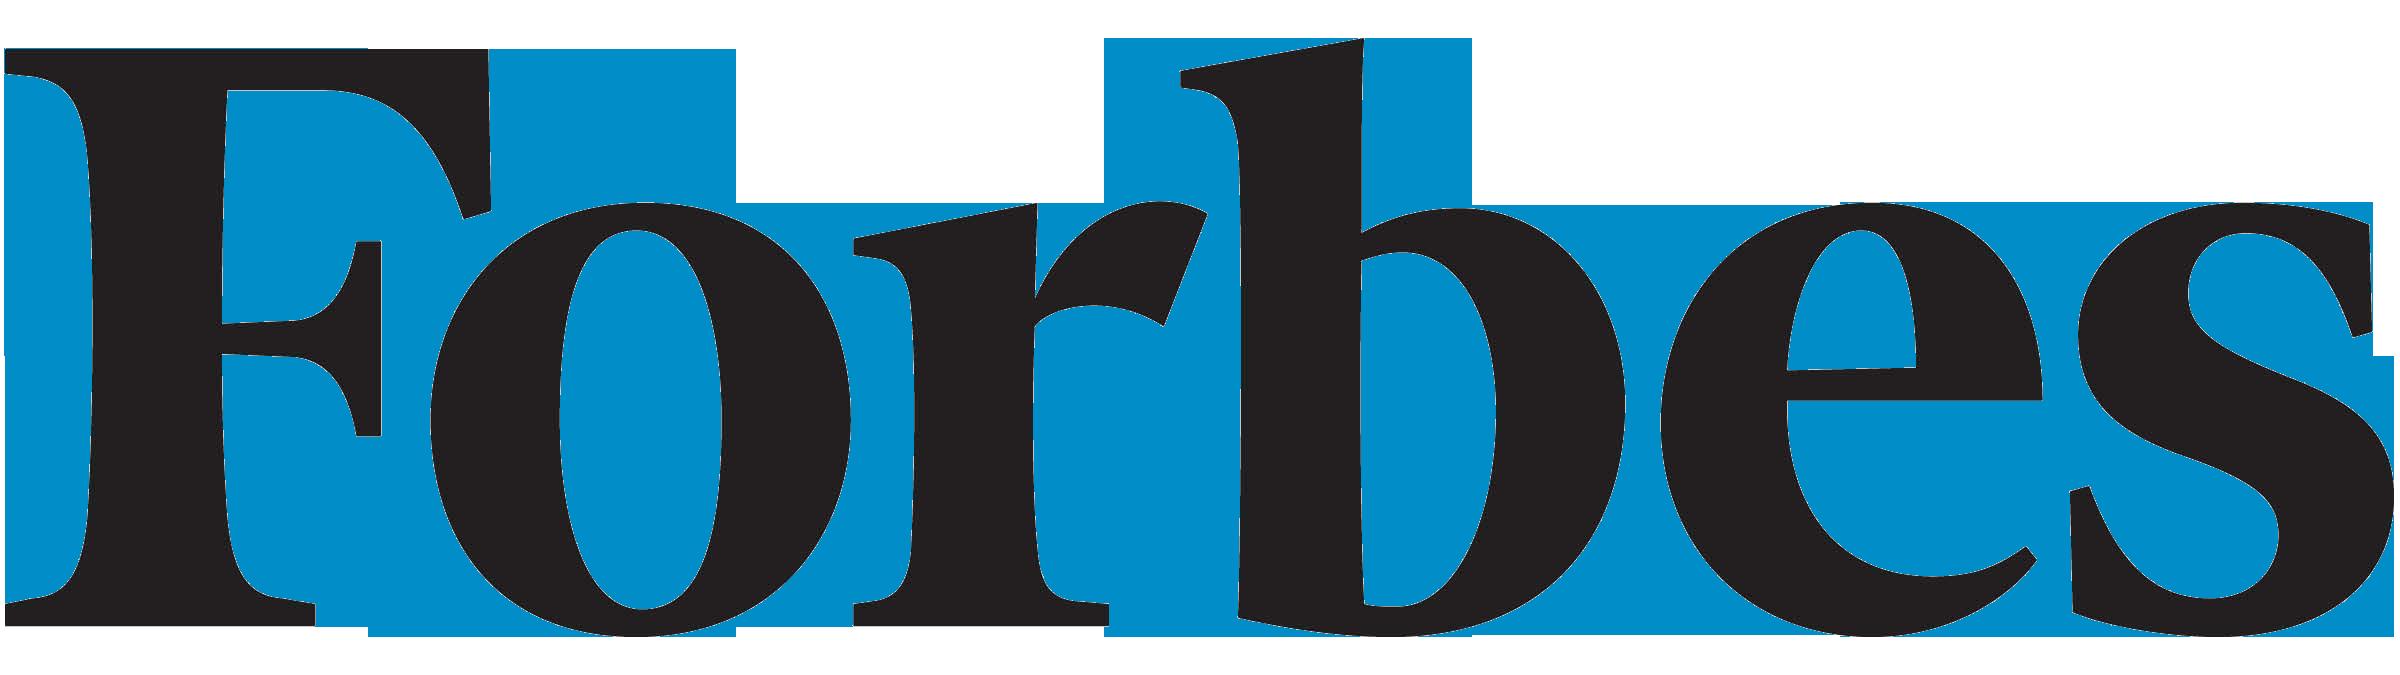 forbes logo blk